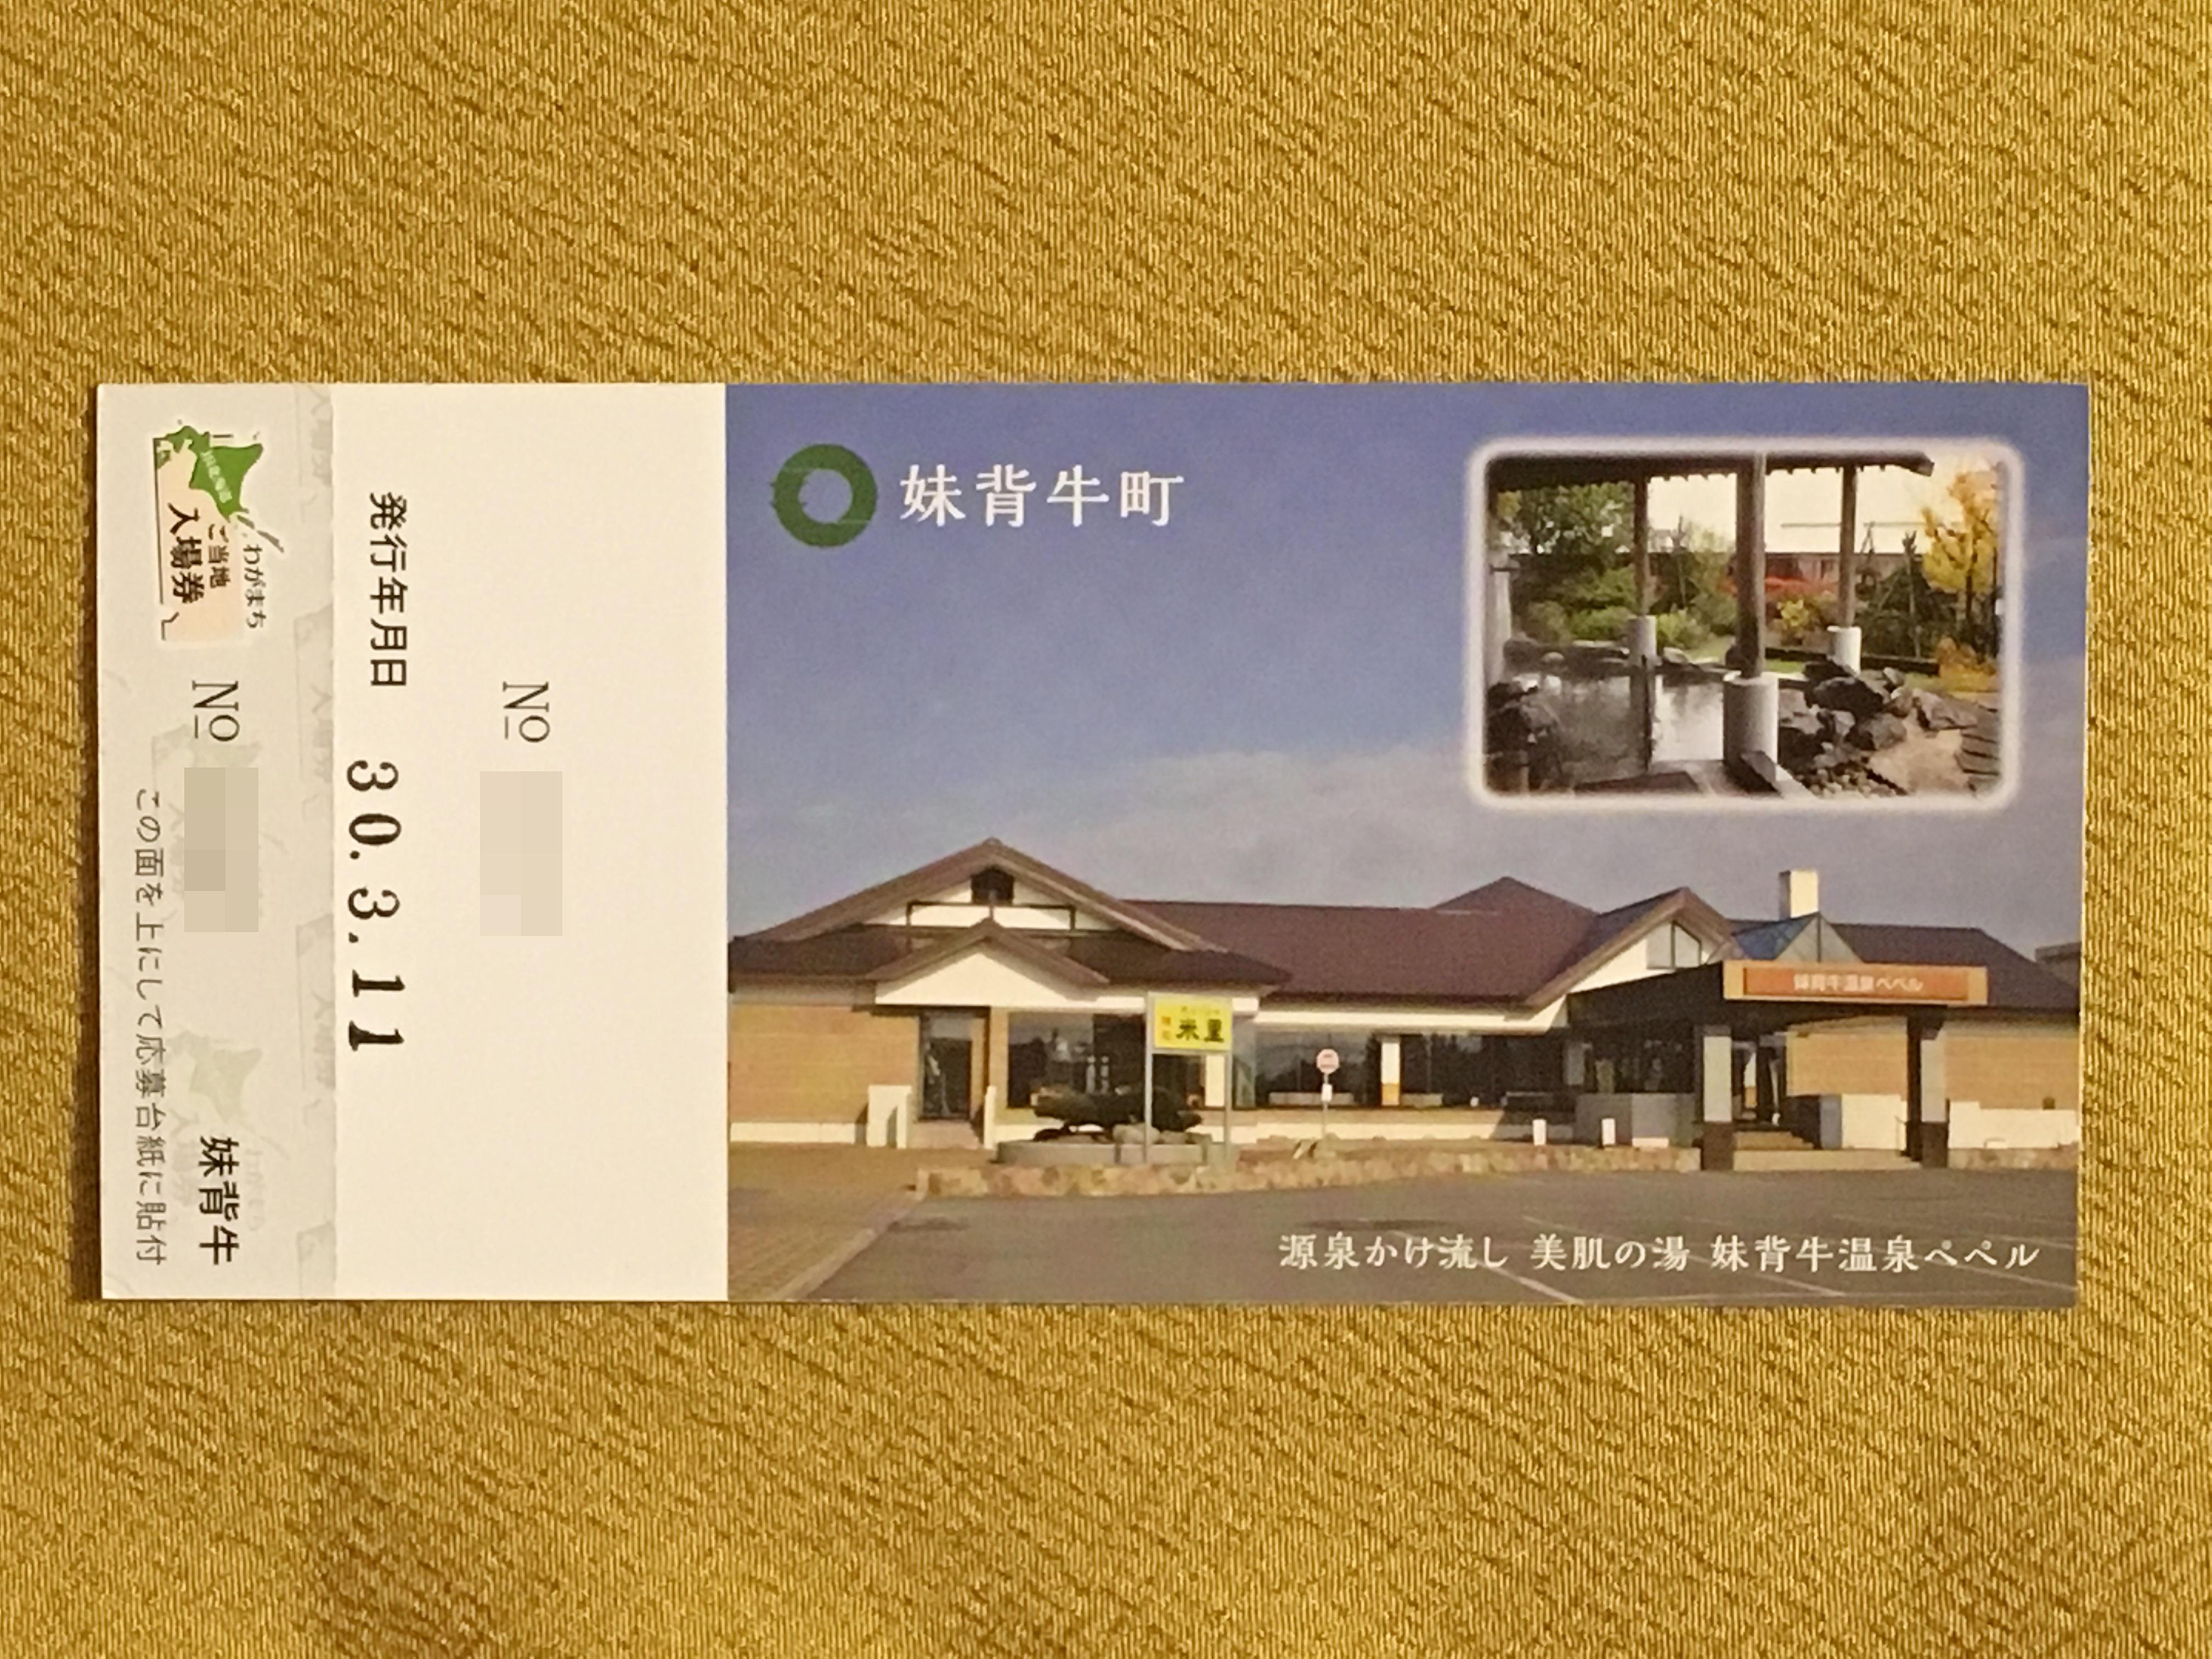 JR北海道ご当地入場券 妹背牛駅裏.JPG